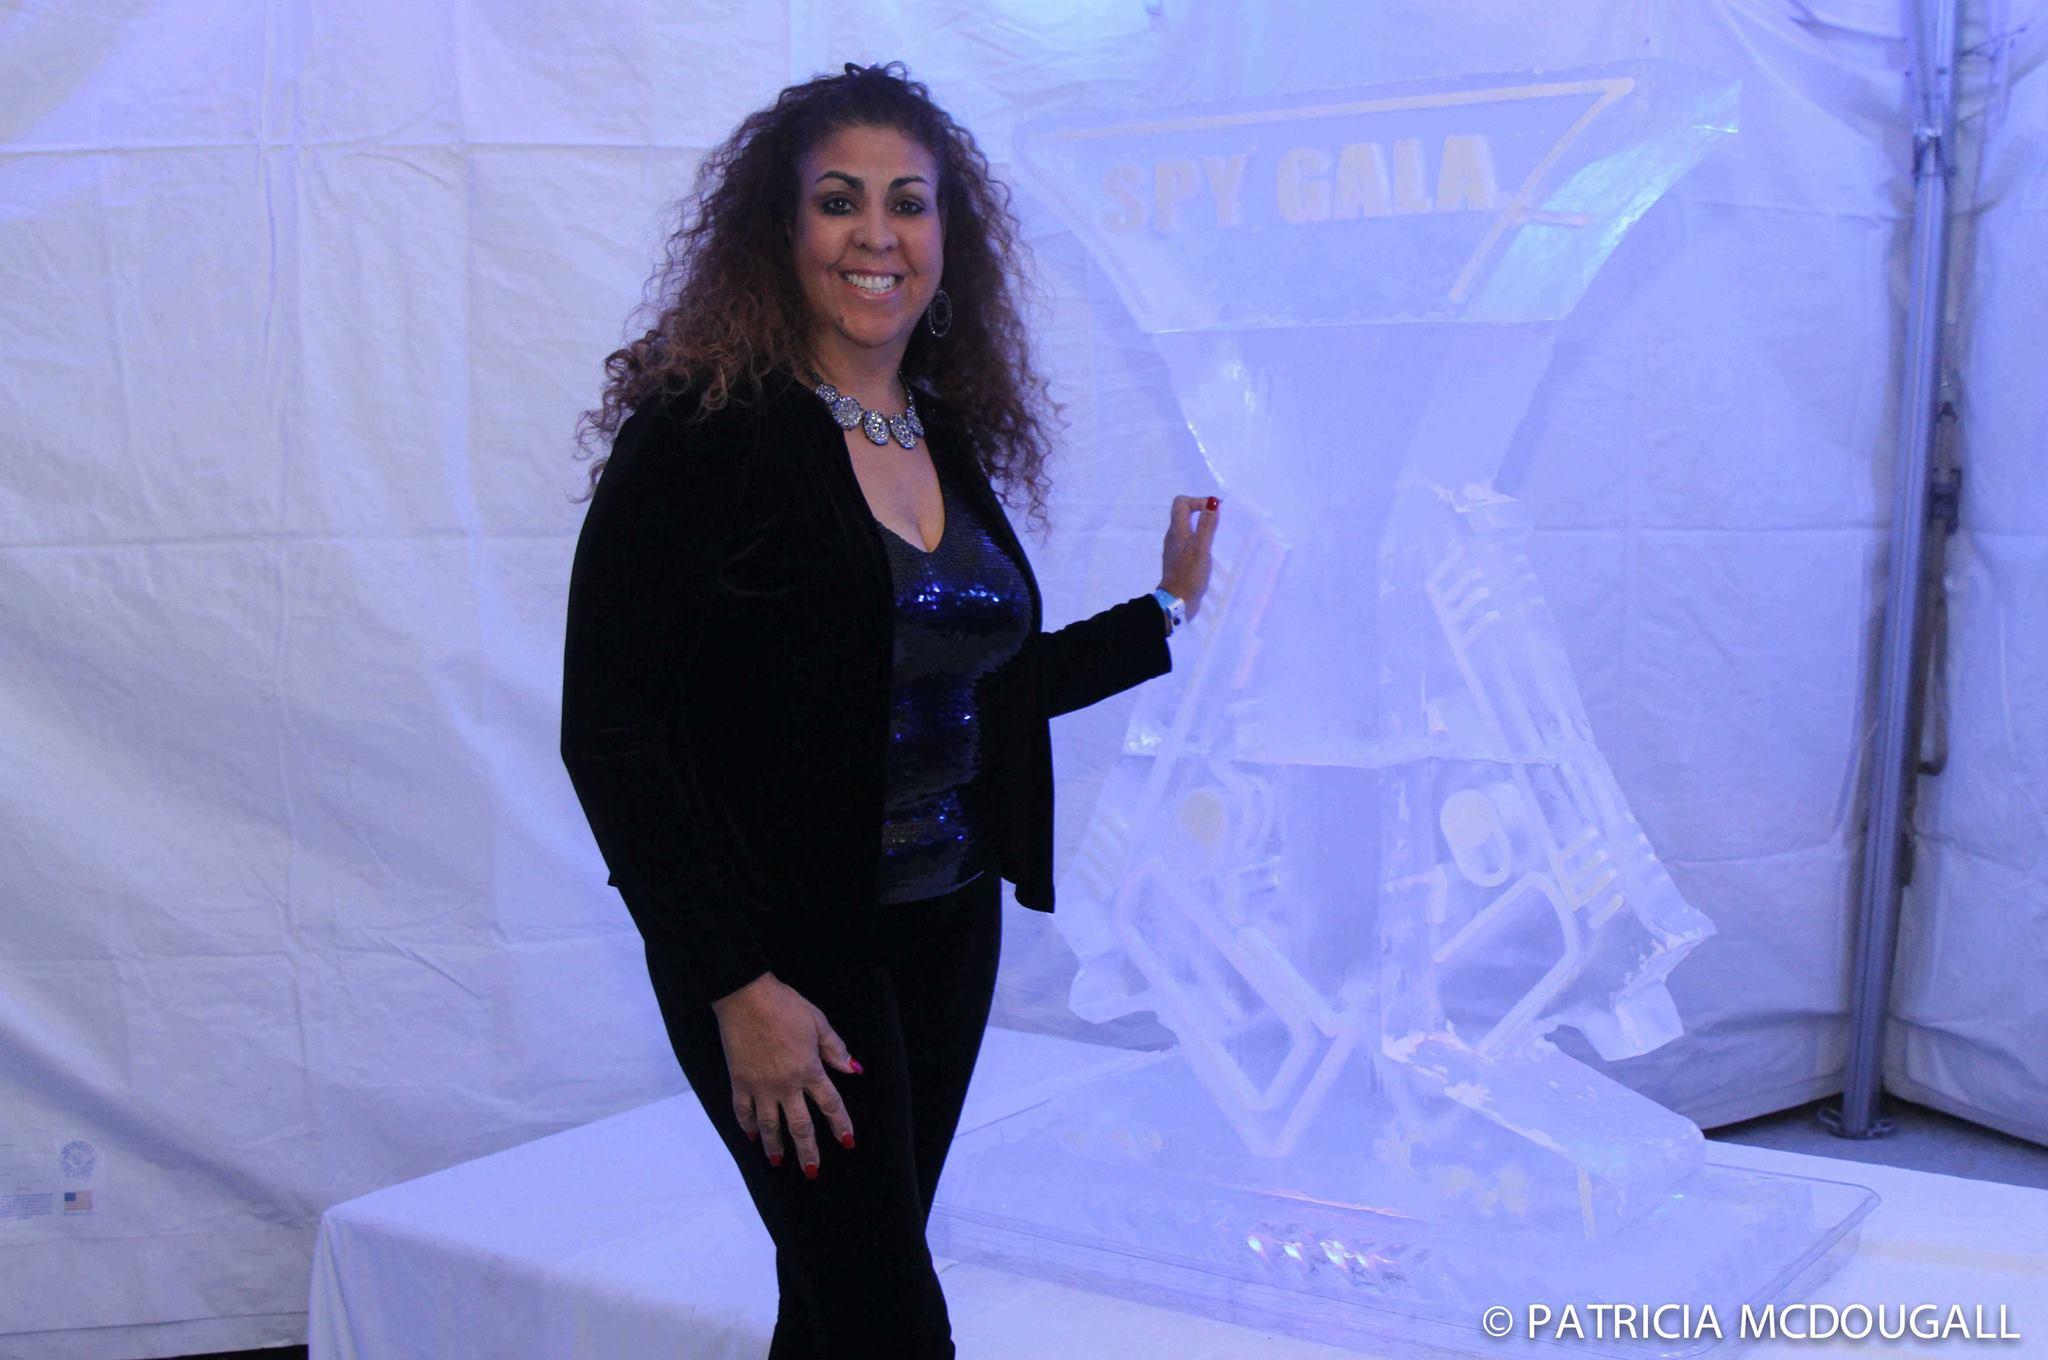 Celebrity Photographer Patricia